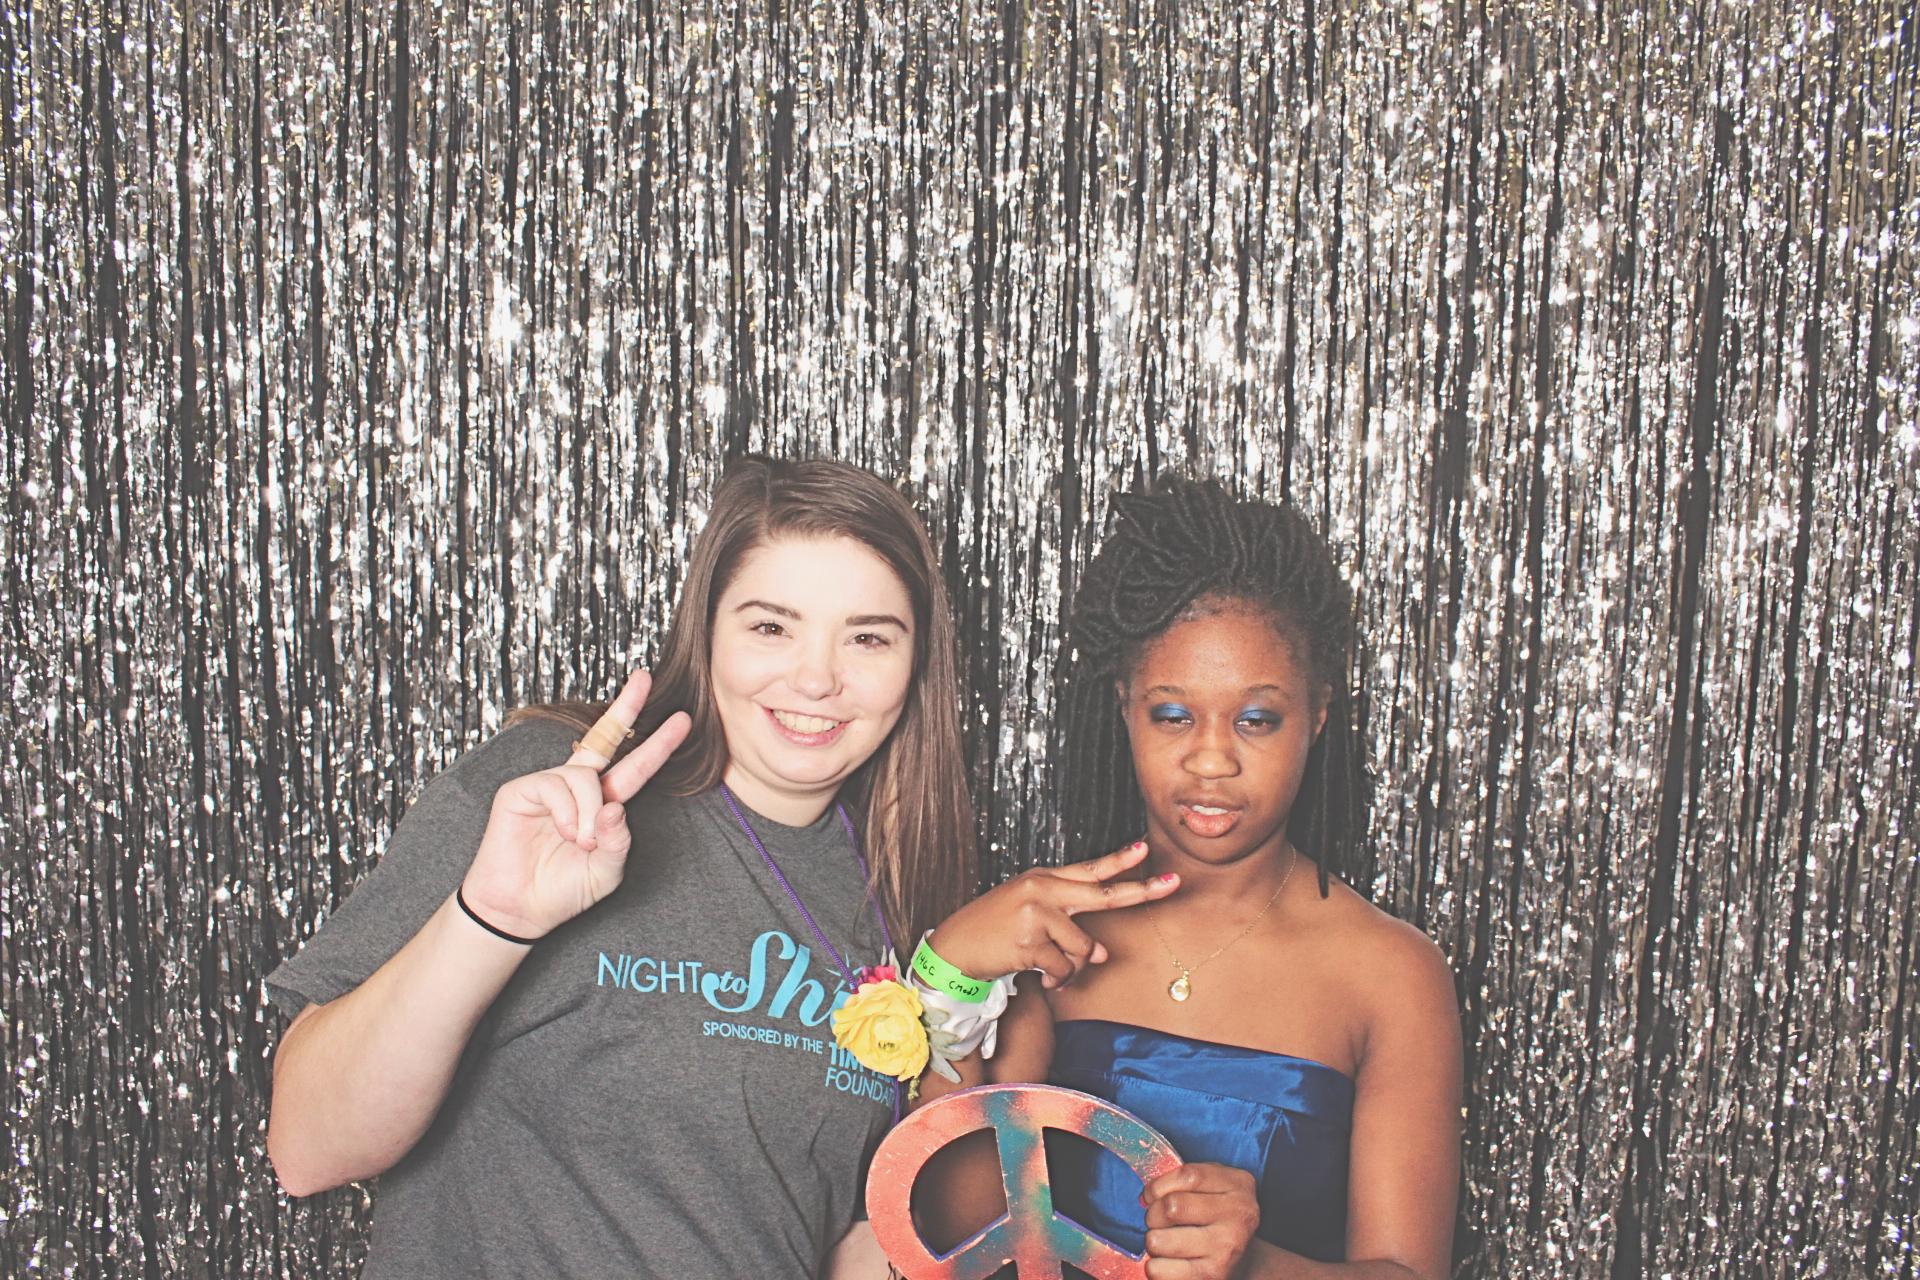 2-8-19 Atlanta Southcrest Church Photo Booth - Night to Shine Coweta 2019 - Robot Booth082.jpg